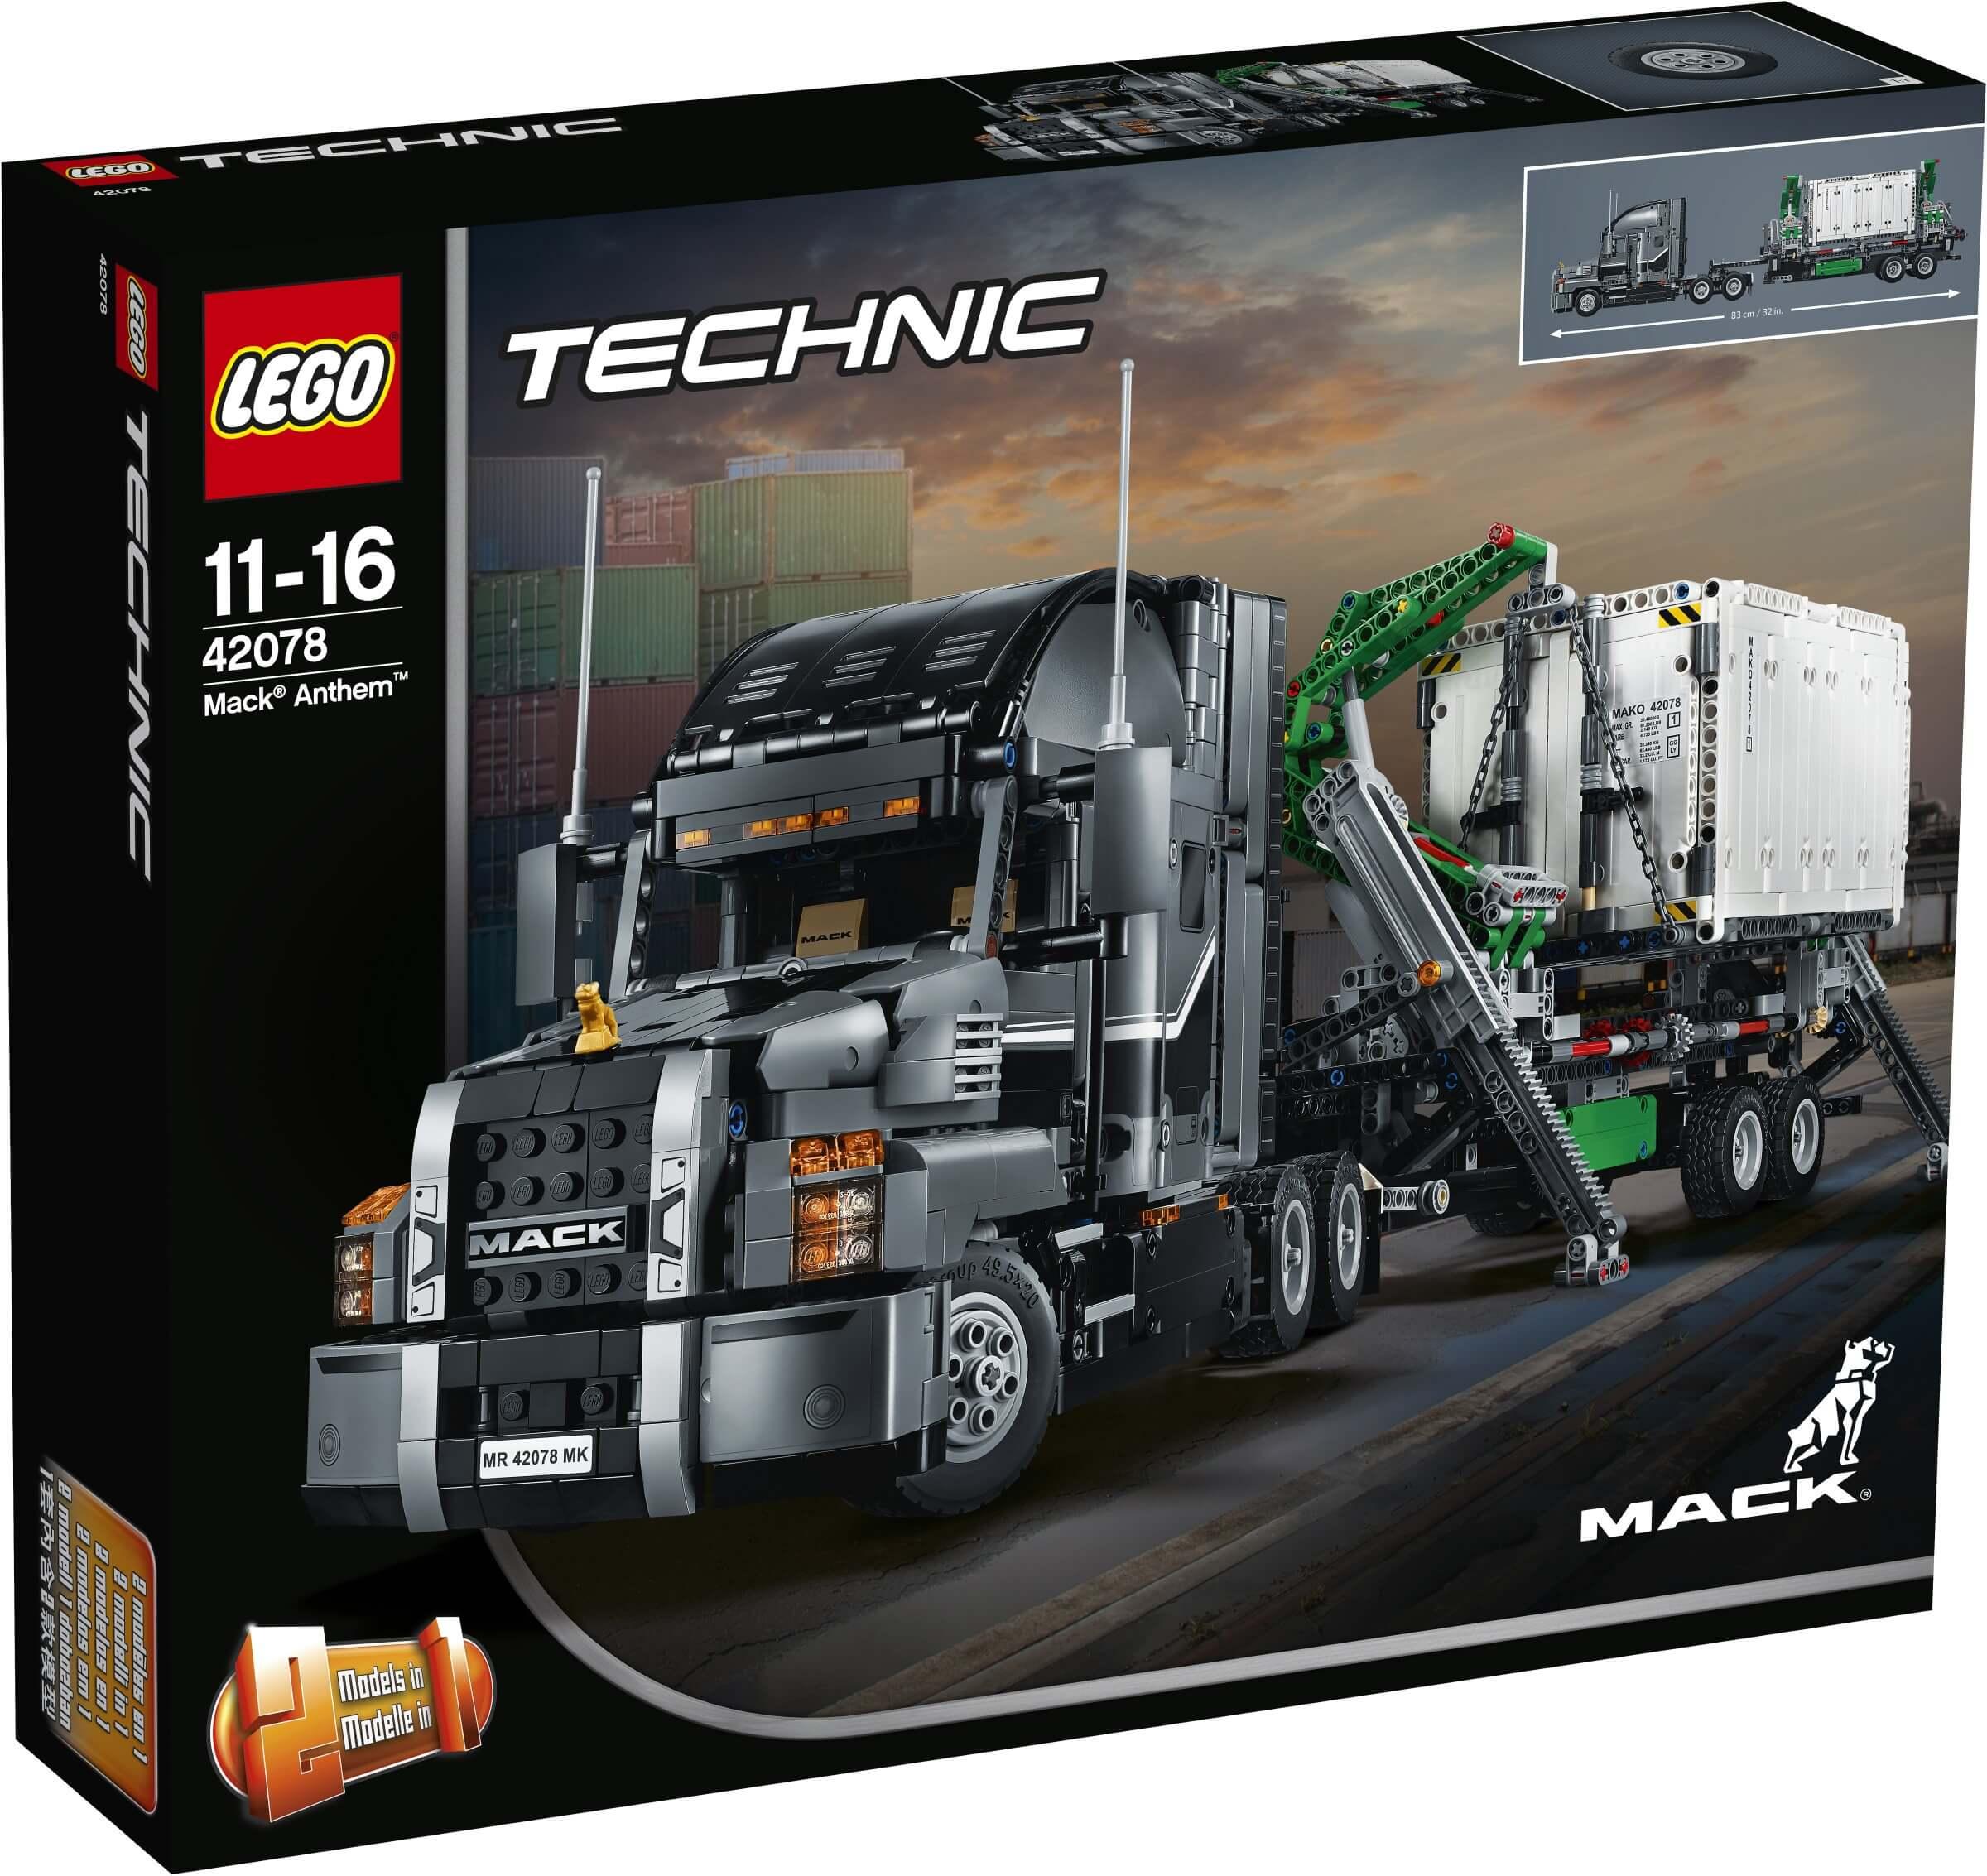 Mua đồ chơi LEGO 42078 - LEGO Technic 42078 - Xe Tải Cẩu Container Mack Anthem (LEGO Technic 42078 Mack Anthem)